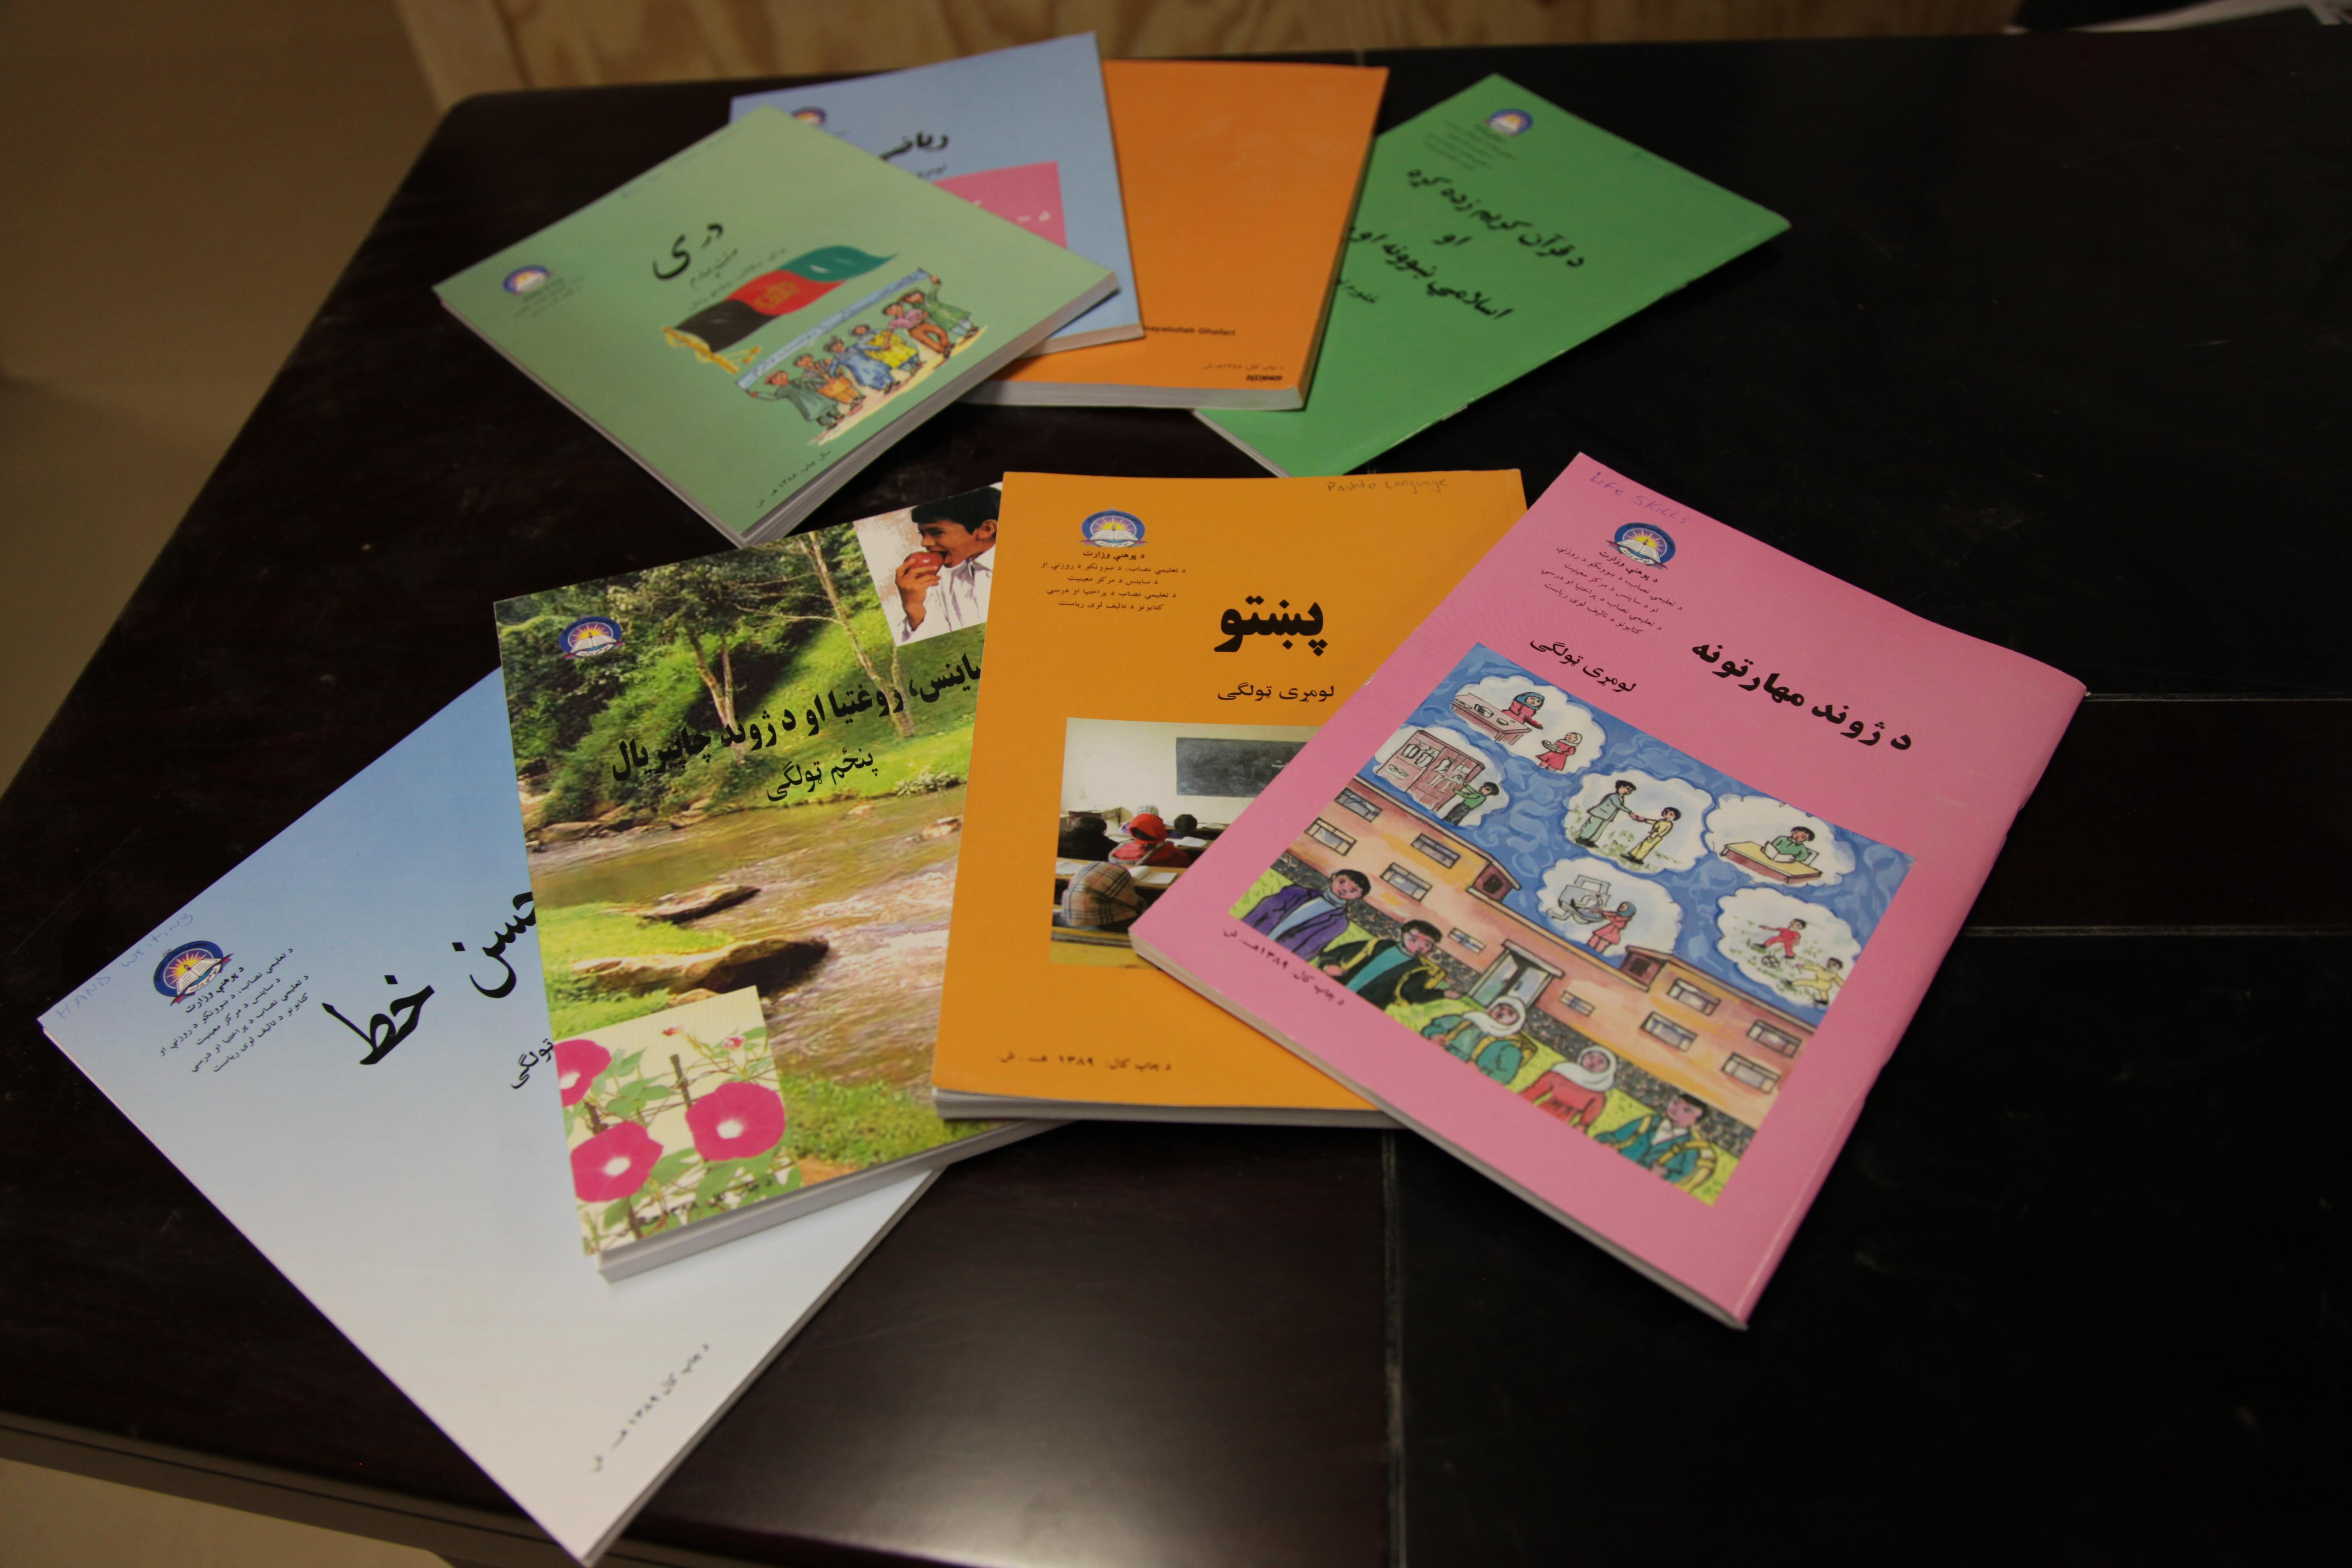 Pashto literature and poetry - Wikipedia